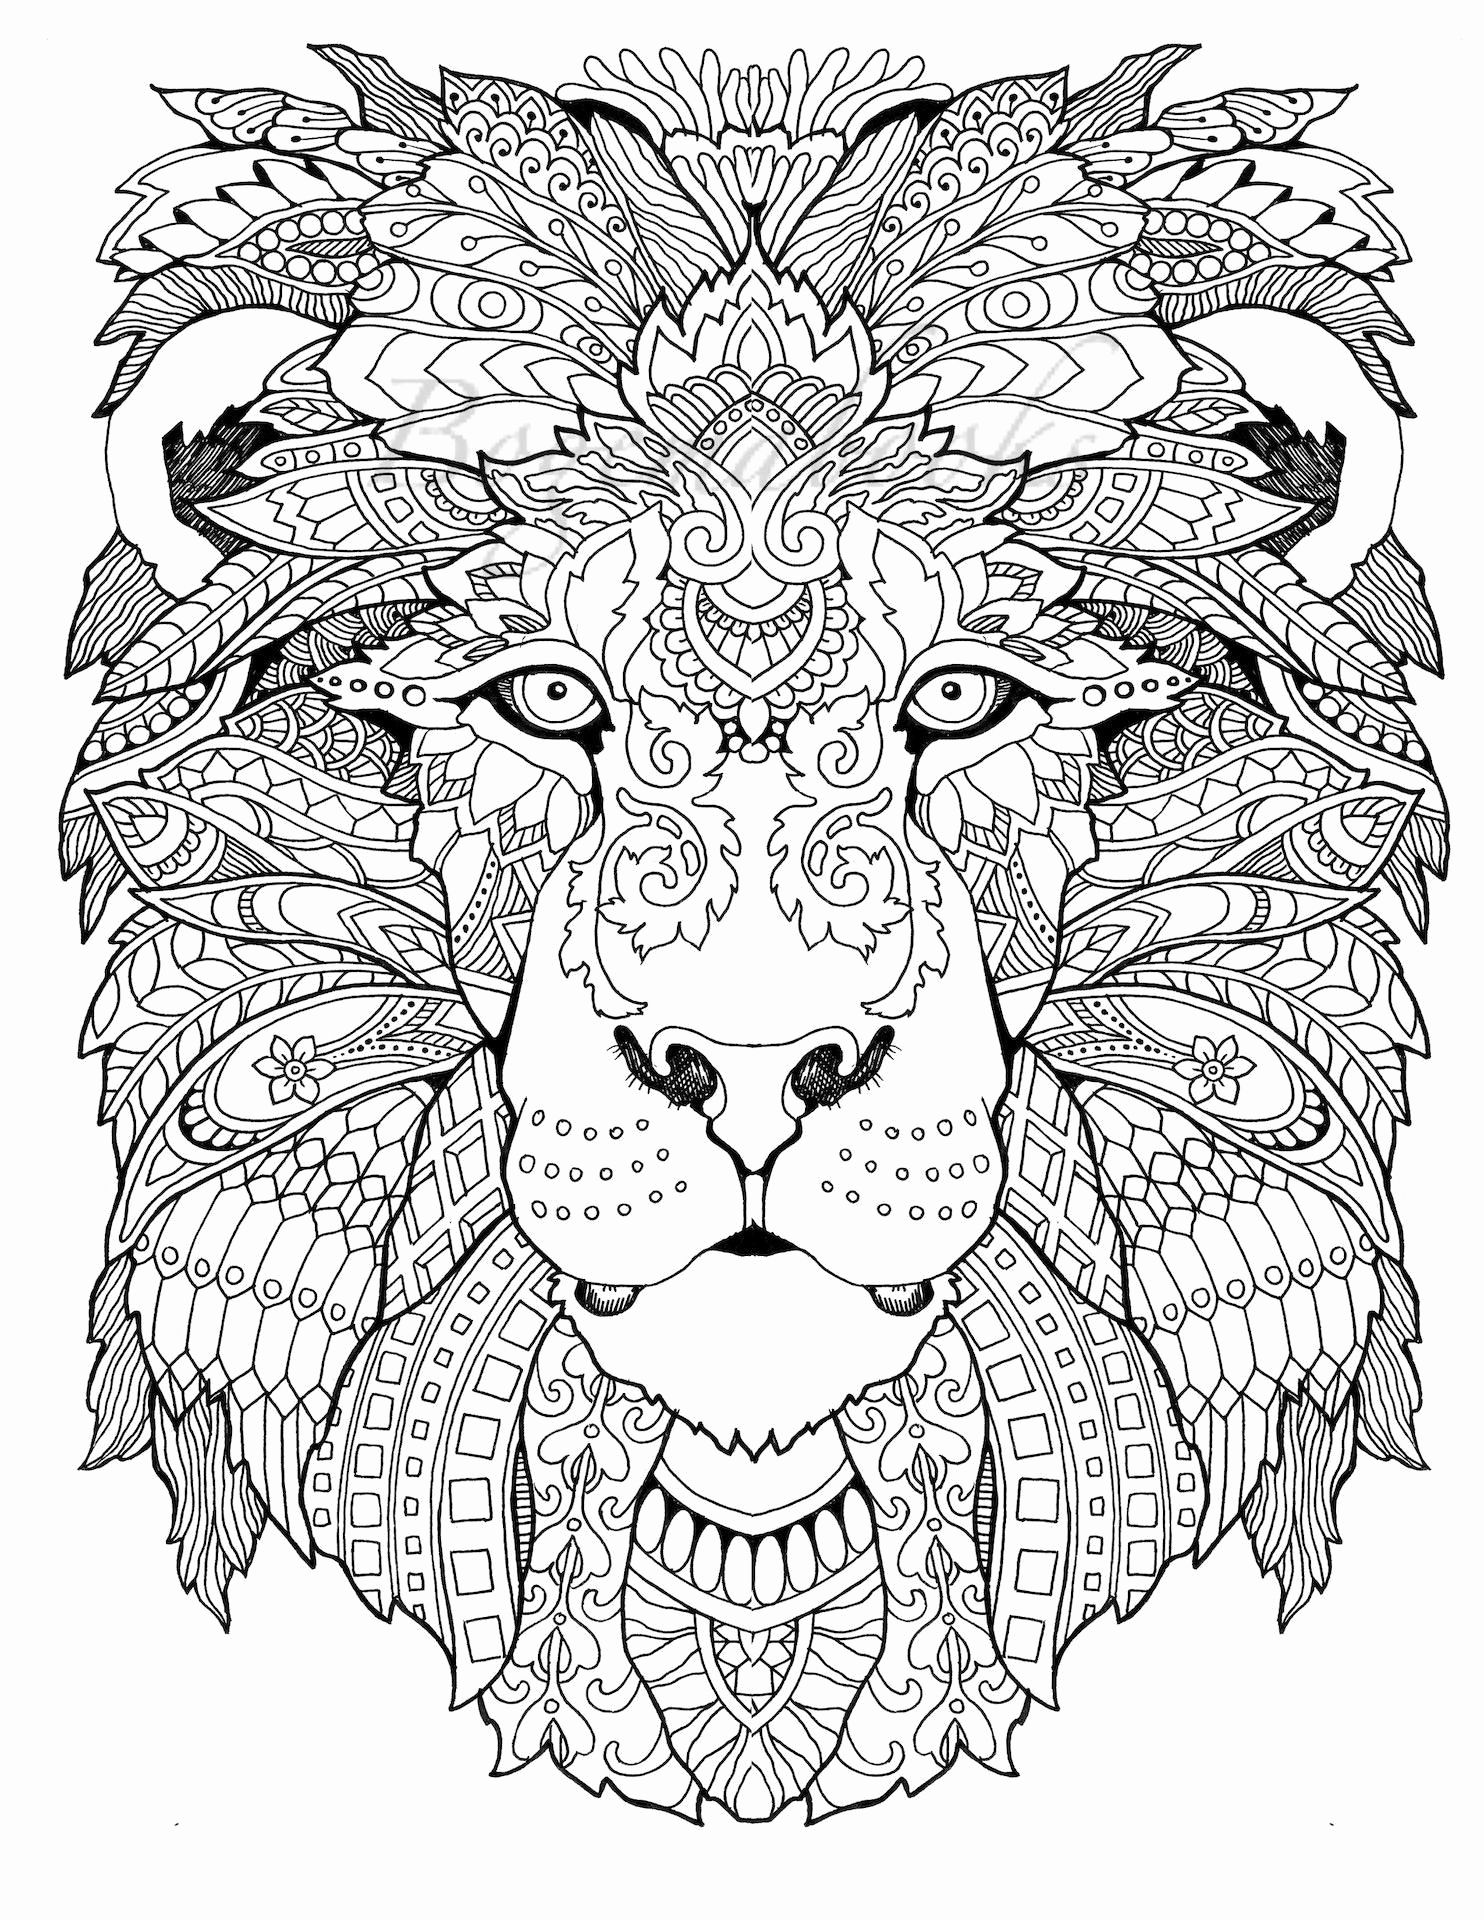 Nature Coloring Sheets Pdf Lion Coloring Pages Animal Coloring Books Animal Coloring Pages